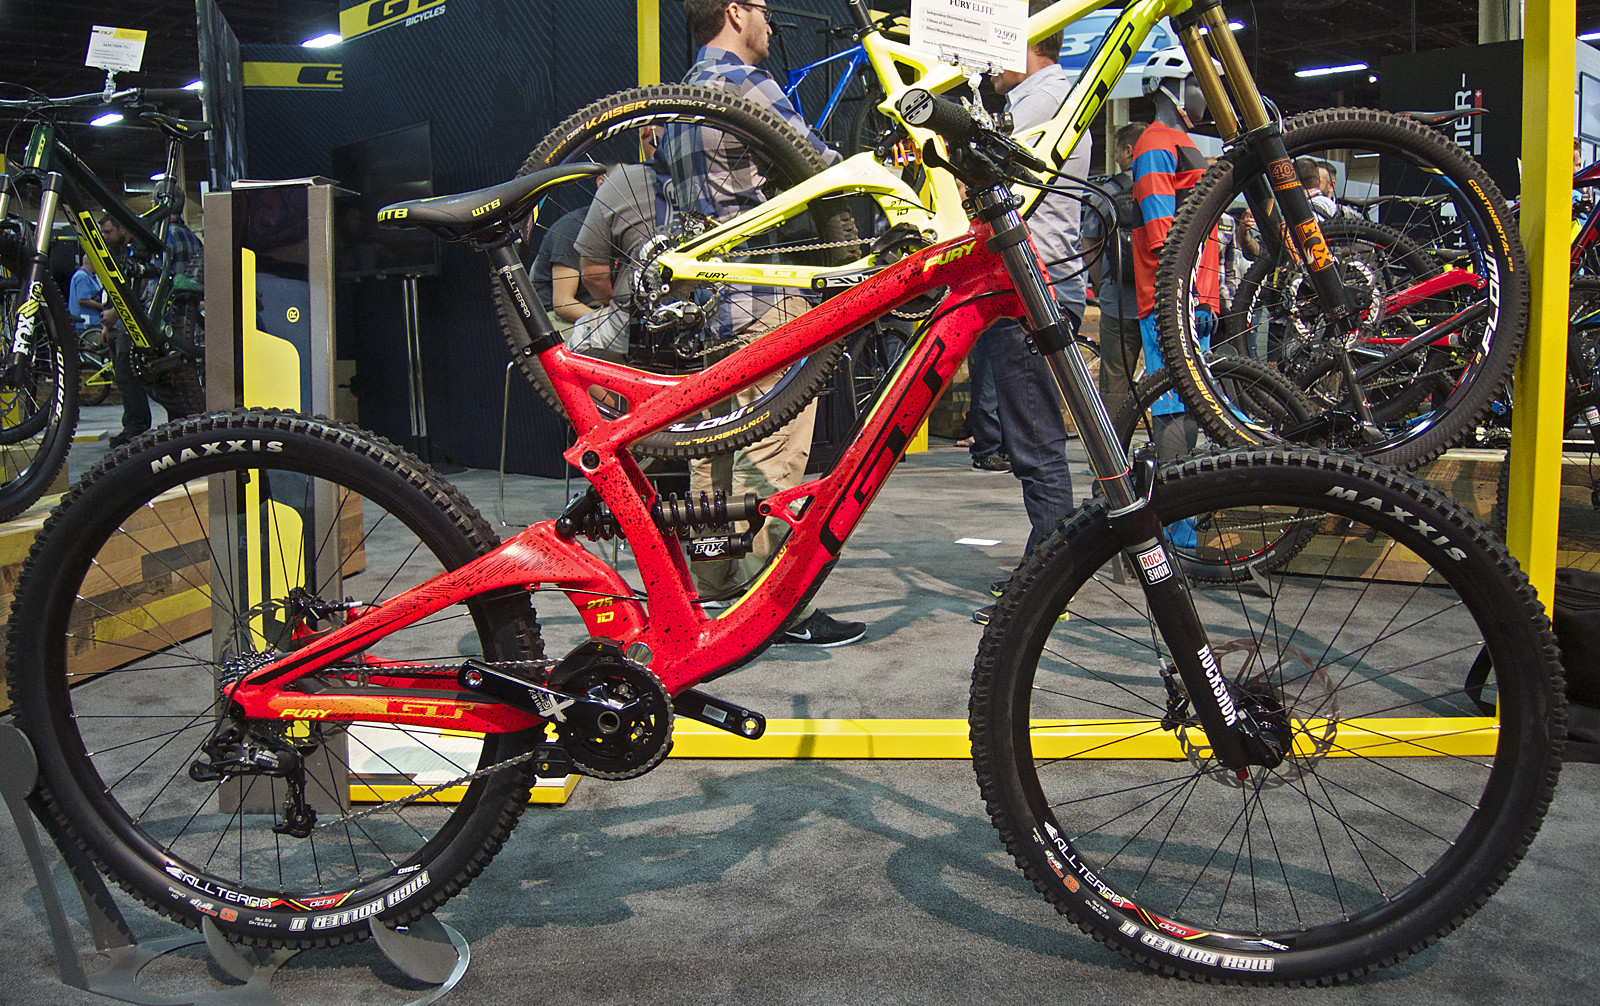 09f7dd51b06 2016 GT Fury Elite DH Bike - 2016 Downhill Bikes at Interbike - Mountain  Biking Pictures - Vital MTB